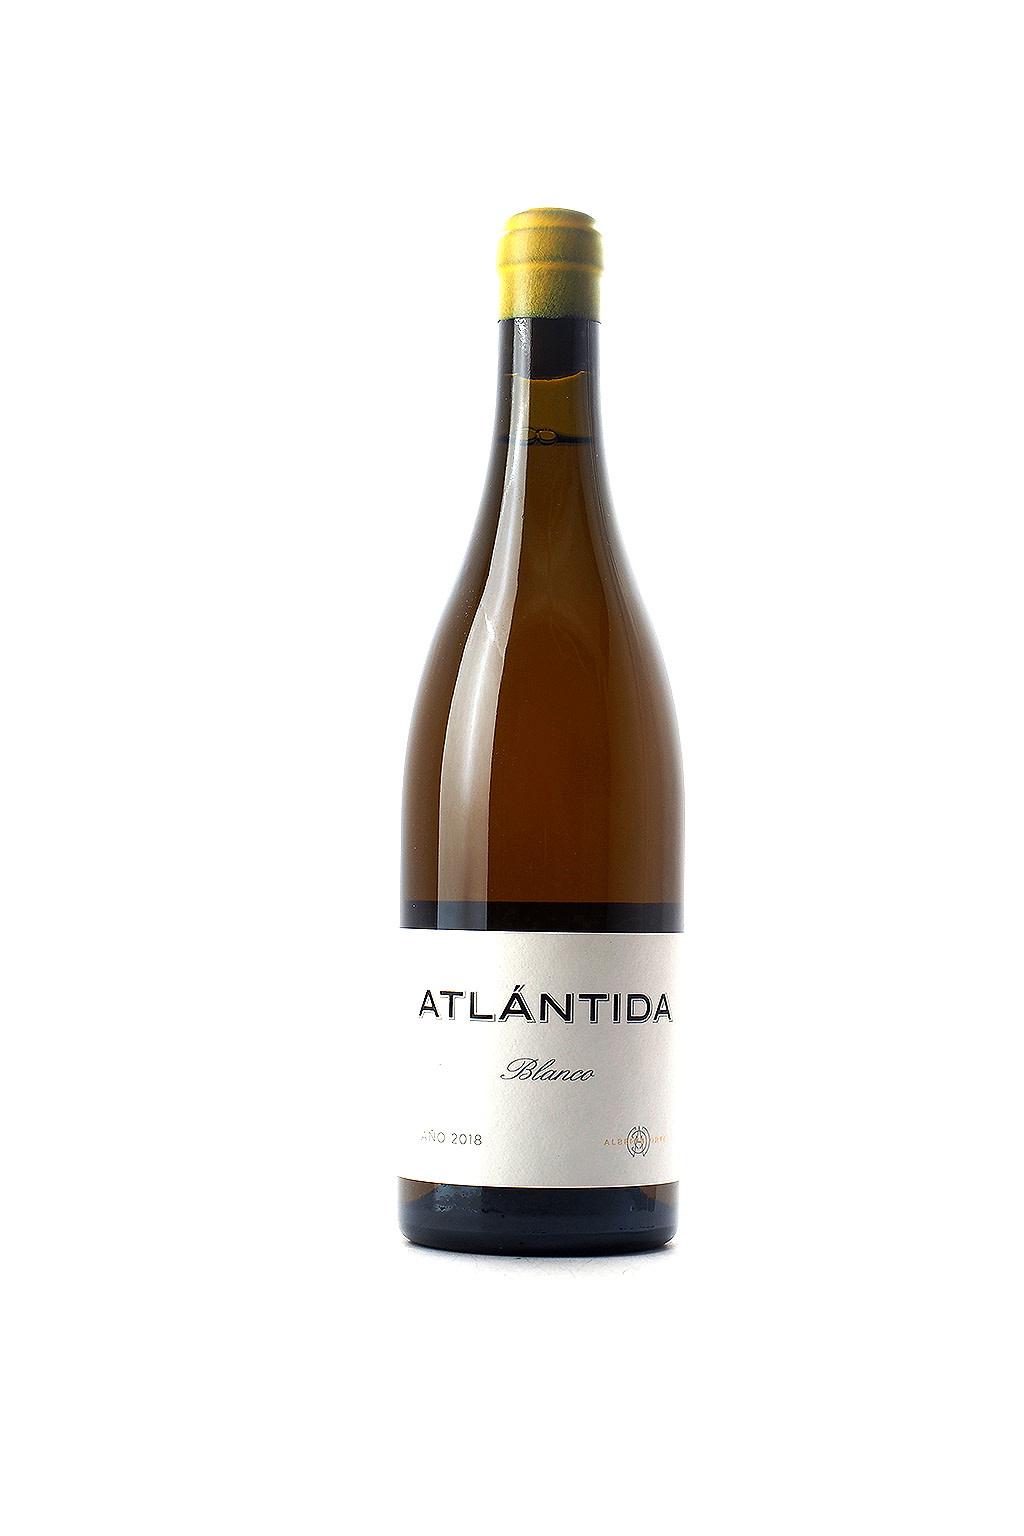 Alberto Orte Atlantida Blanco 2018